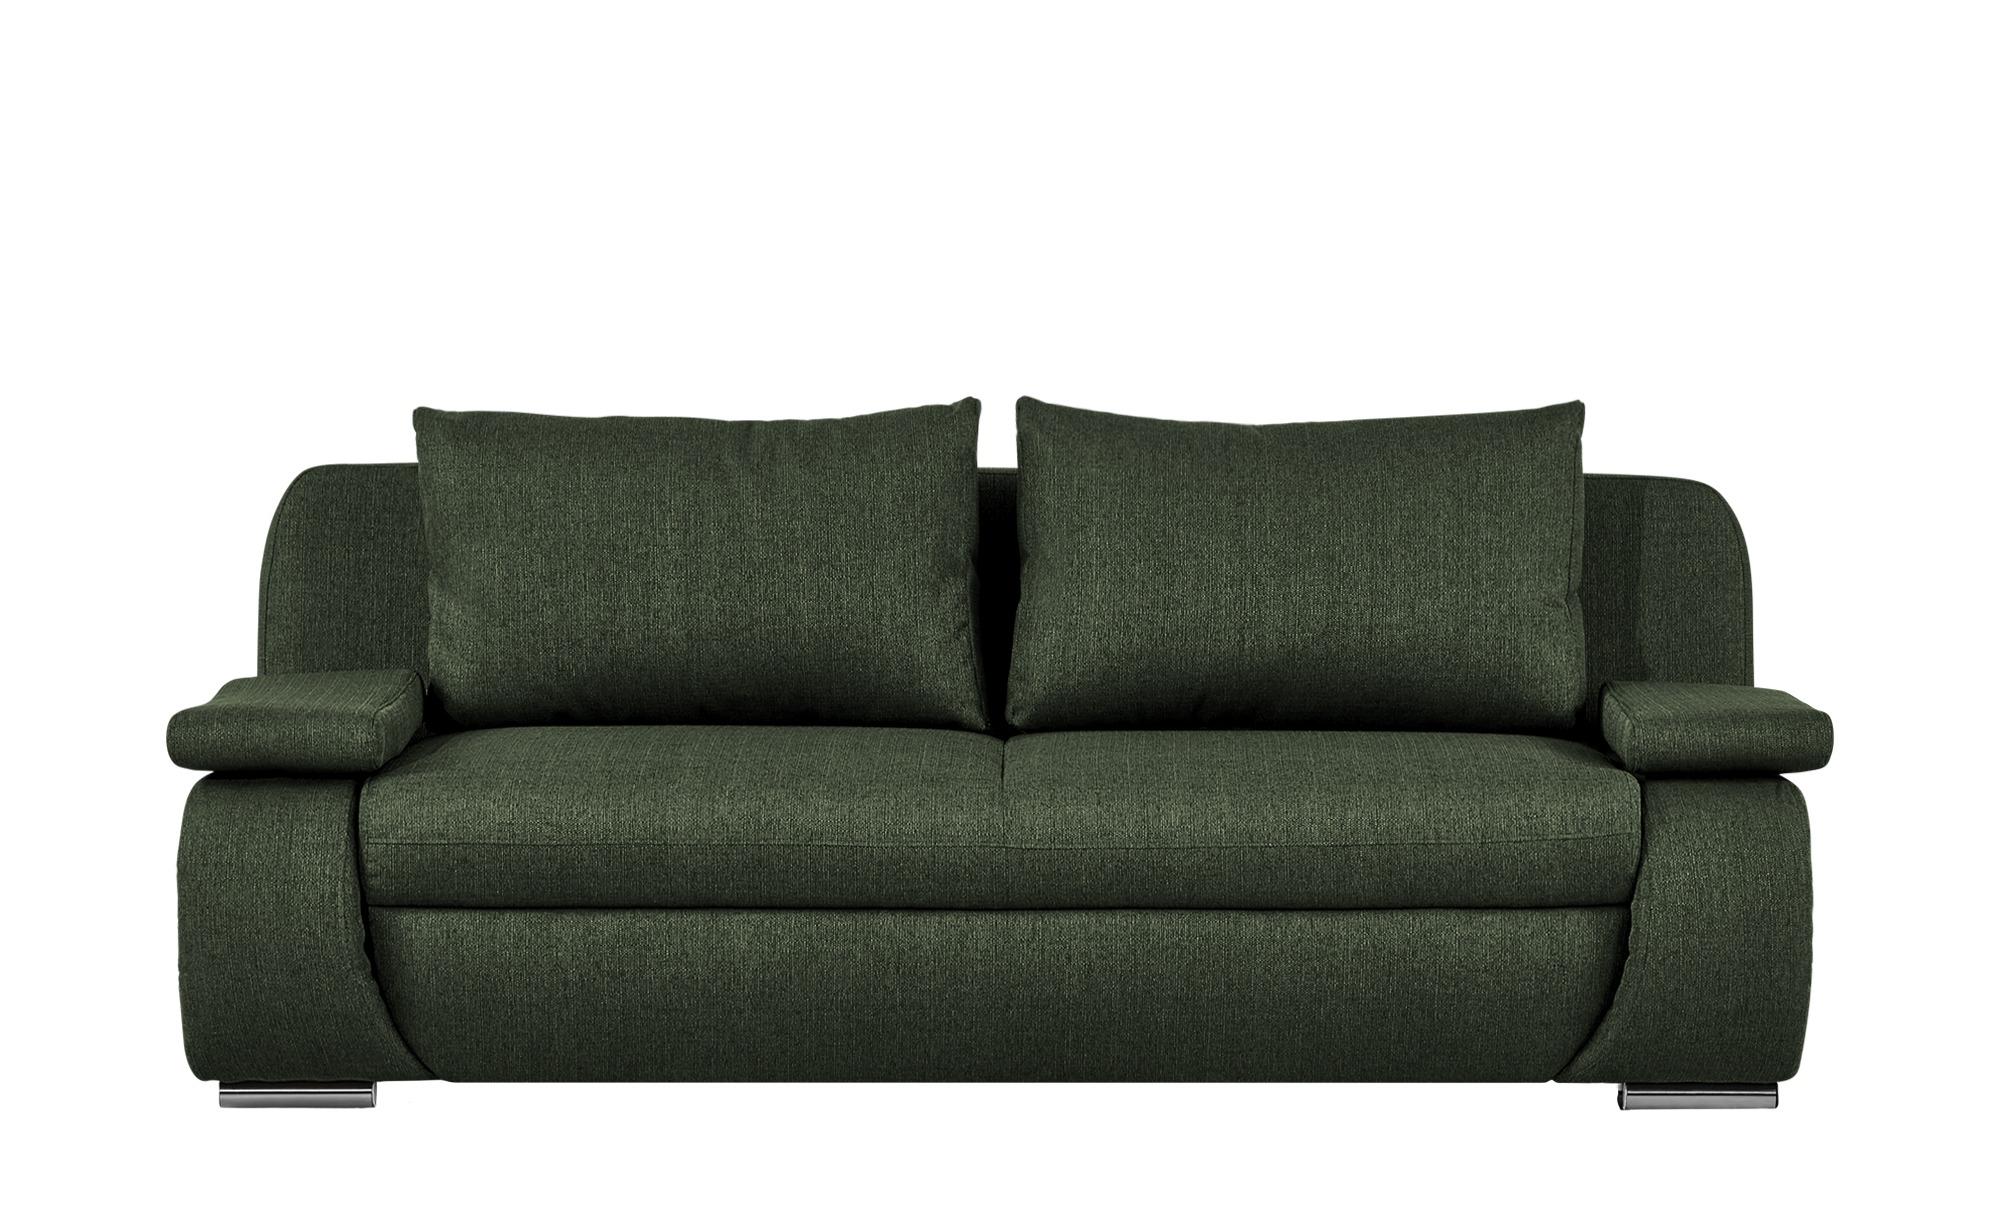 smart Schlafsofa  grün - Webstoff Bonita ¦ grün ¦ Maße (cm): B: 210 H: 87 T: 100 Polstermöbel > Sofas > 2-Sitzer - Höffner